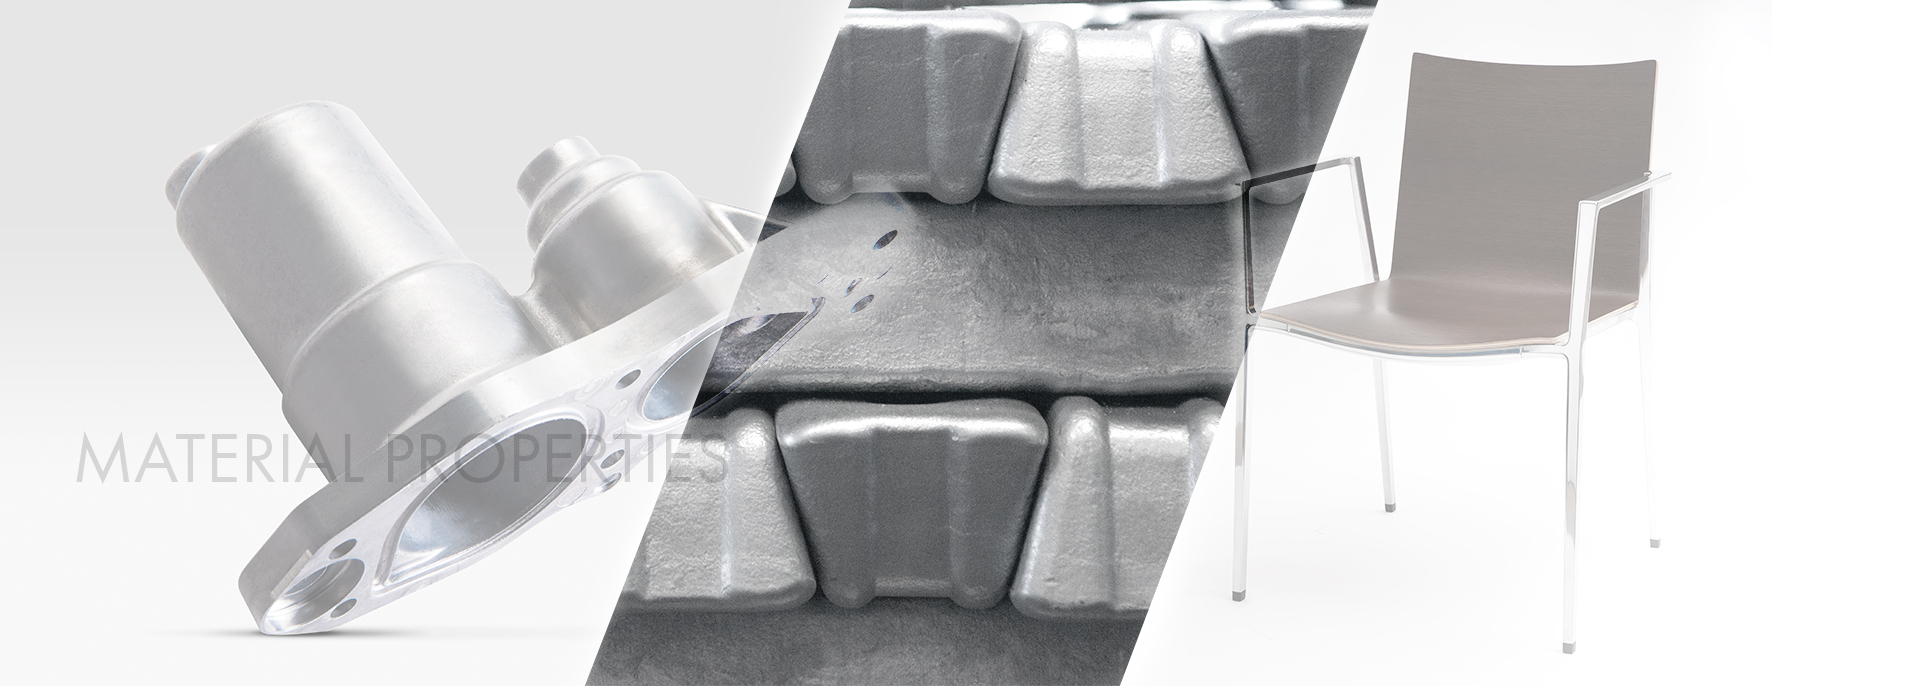 Material properties for aluminium